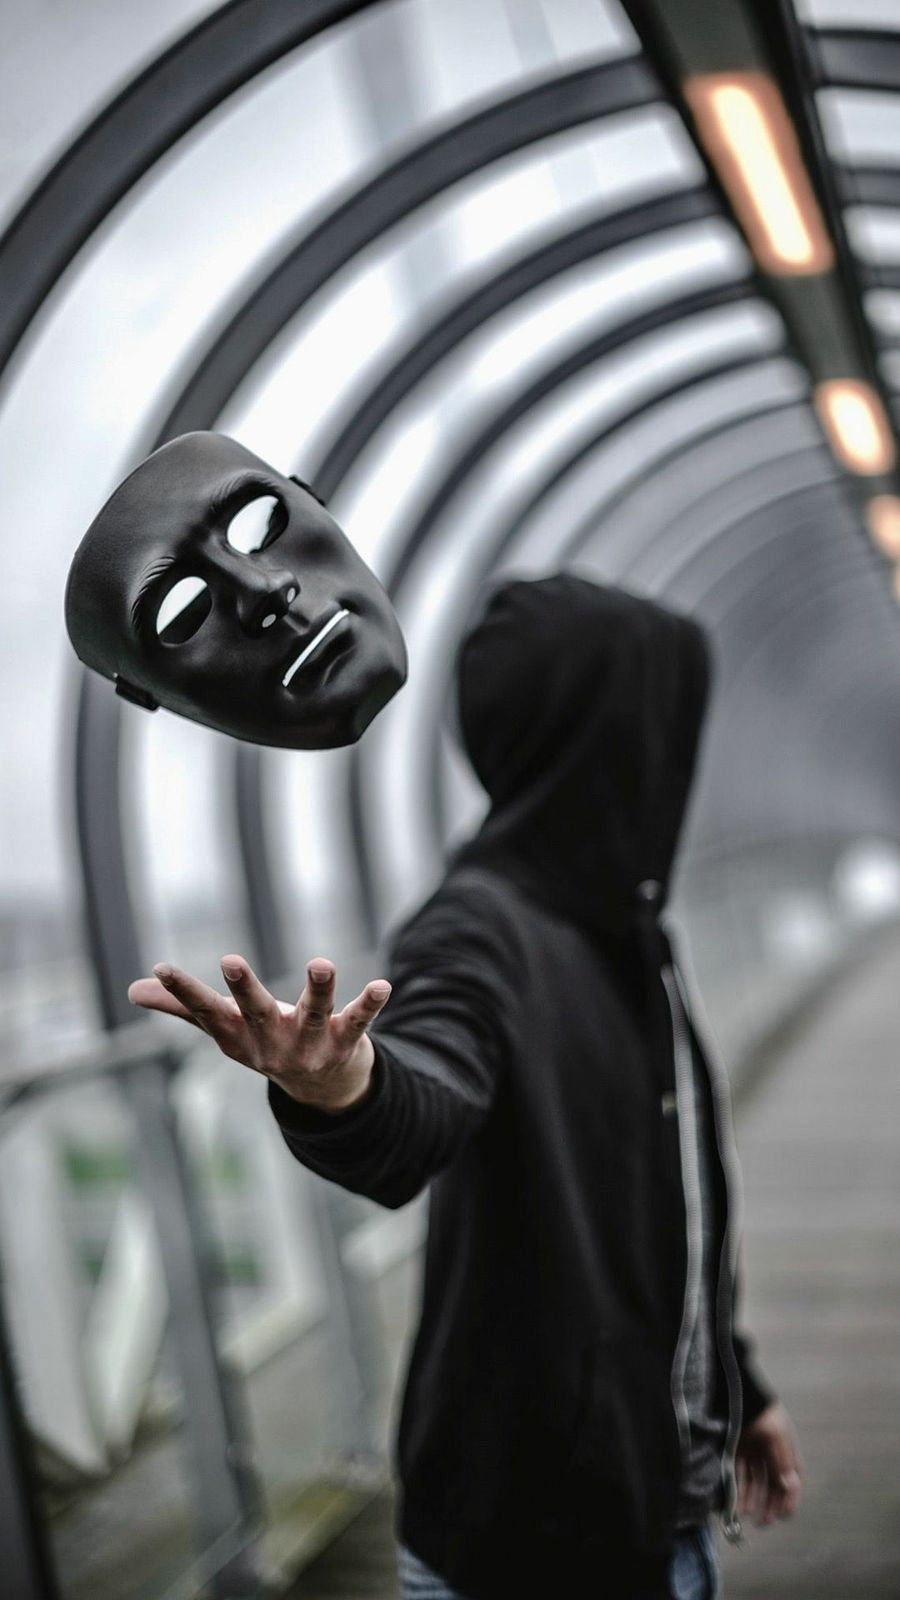 Обои на телефон фотография, маска, изображение, tumblr, photography image, mask off, live